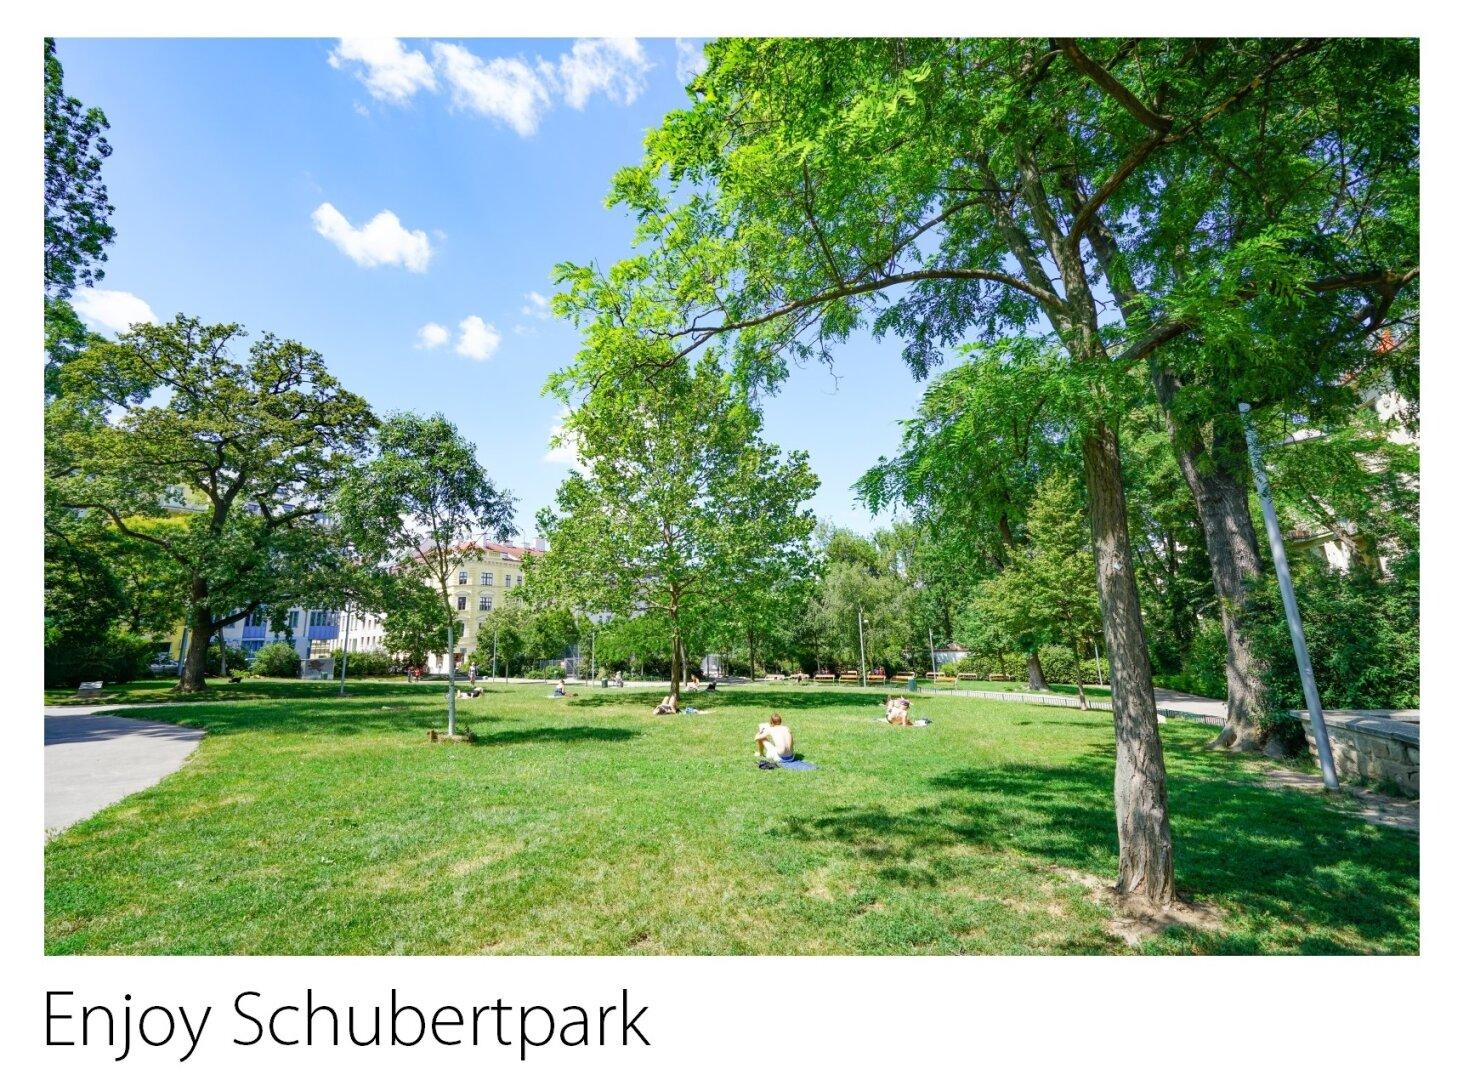 Enjoy Schubertpark